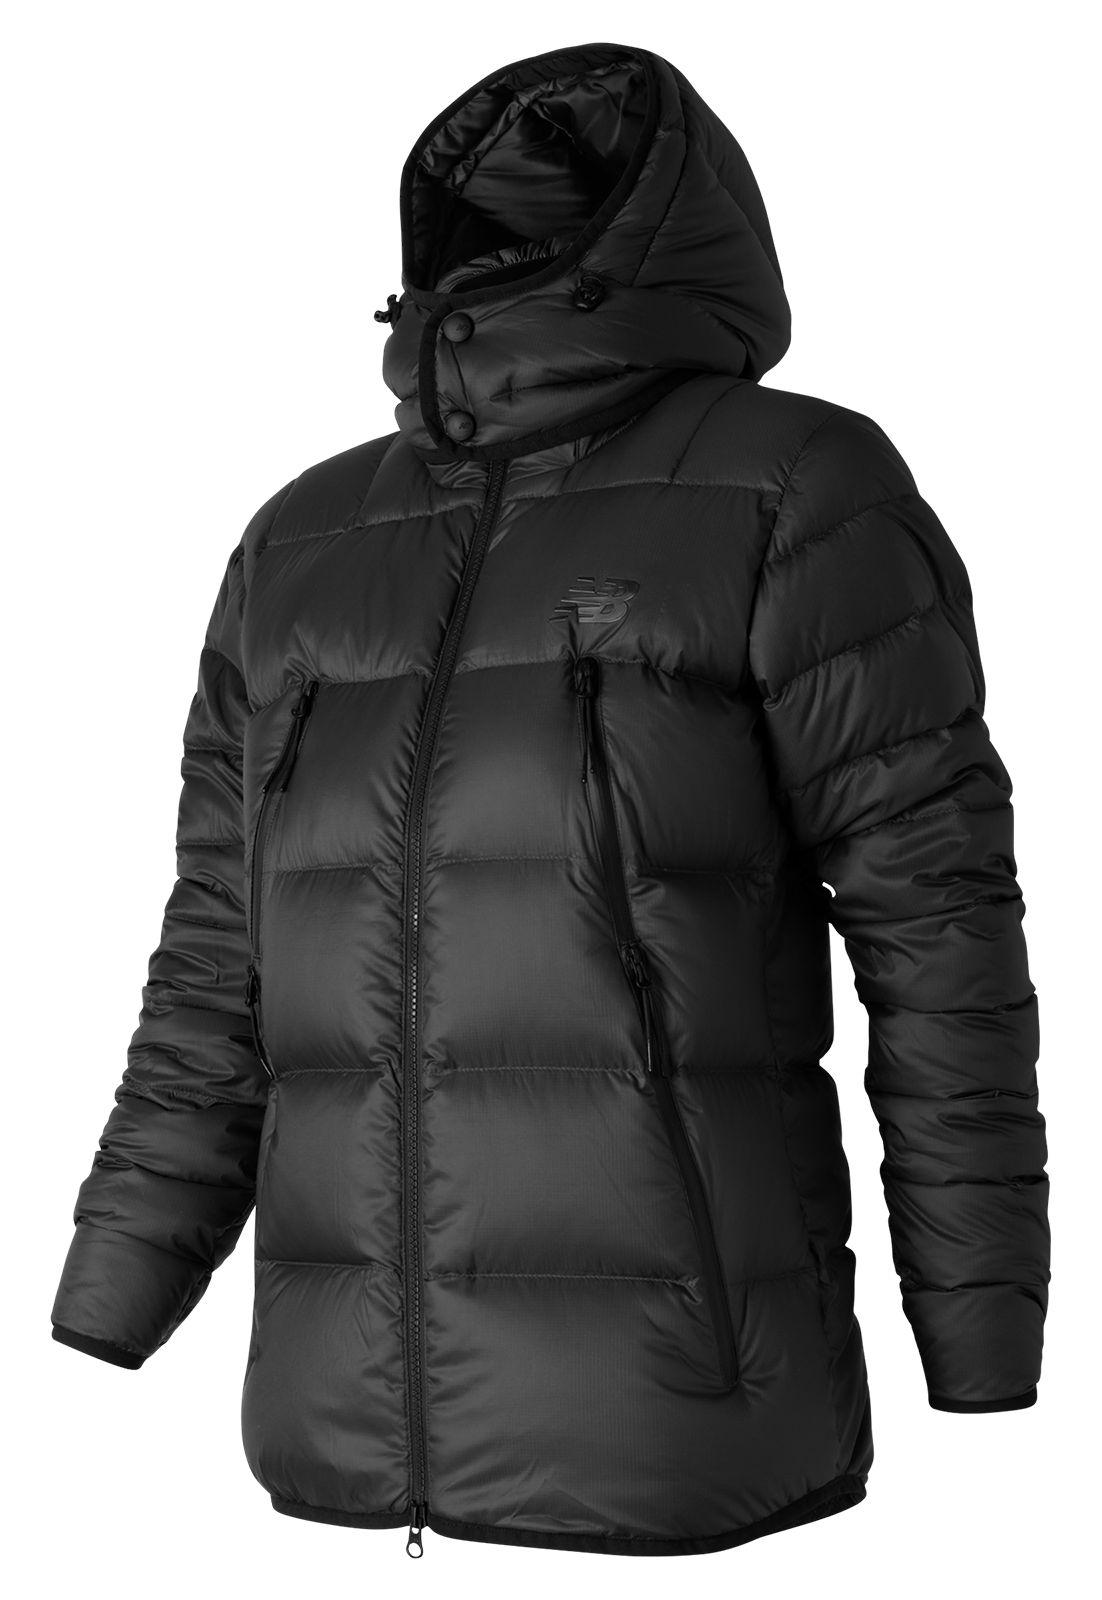 New Balance : Women's Down Jacket : Women's Casual : WJ63502BK